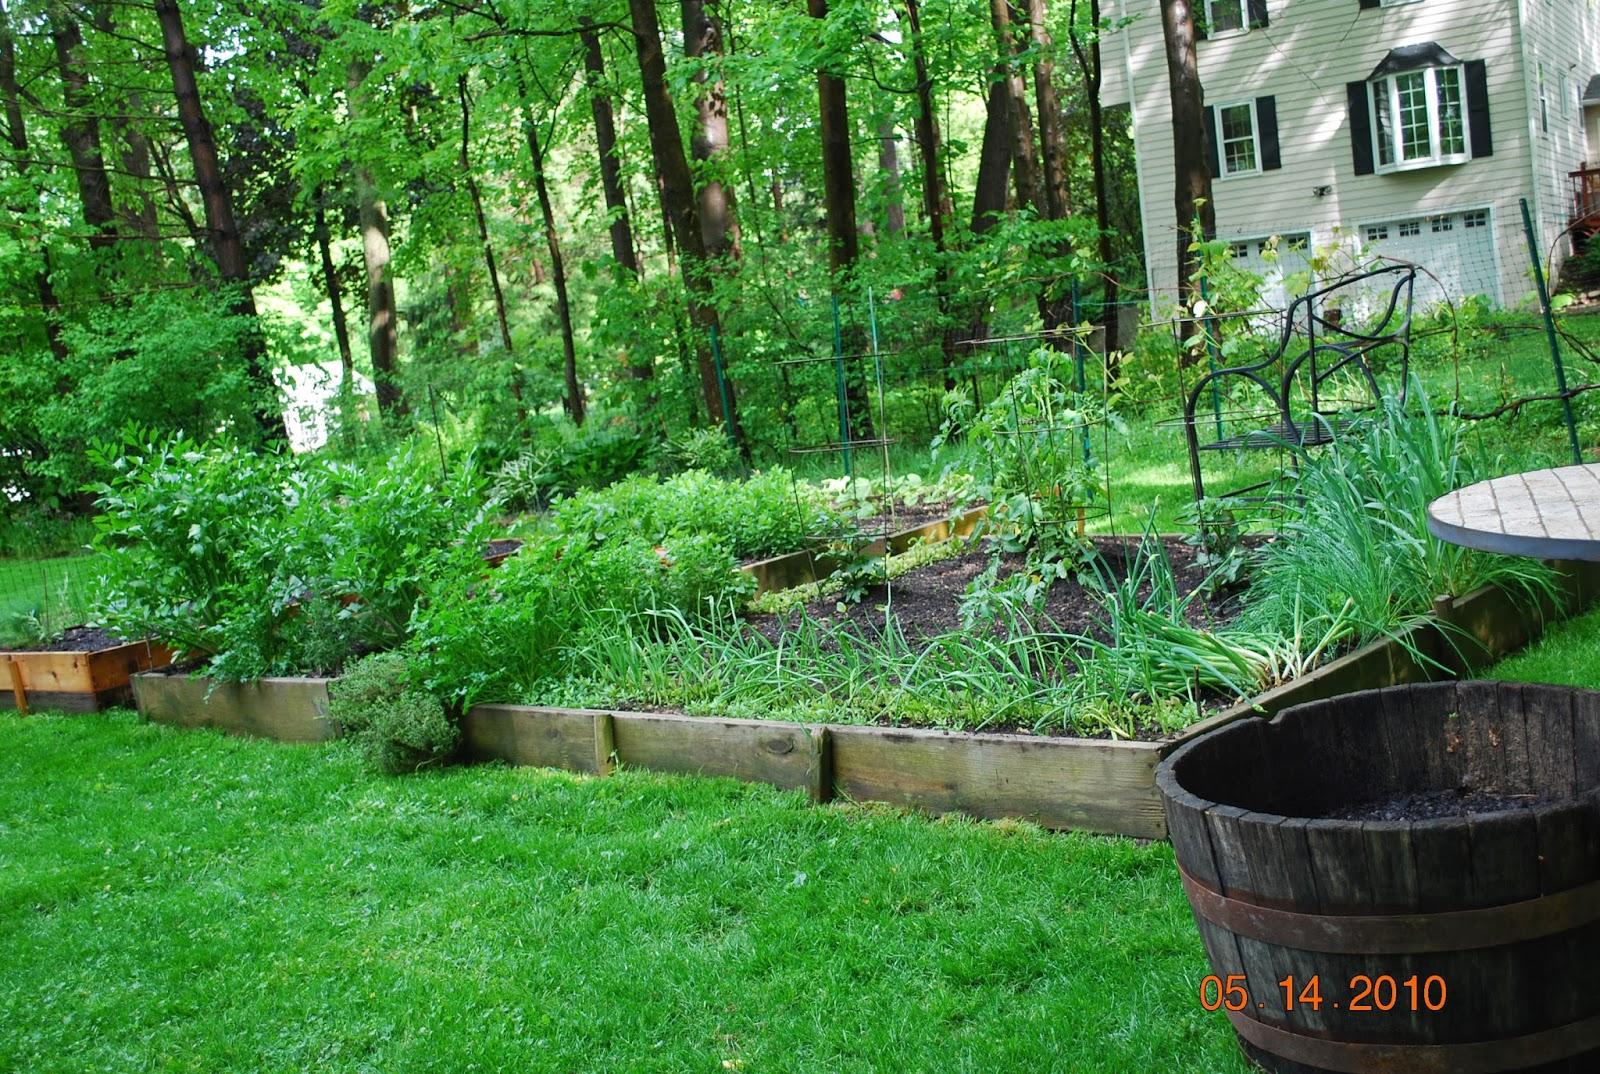 The Vegetable Garden Fence